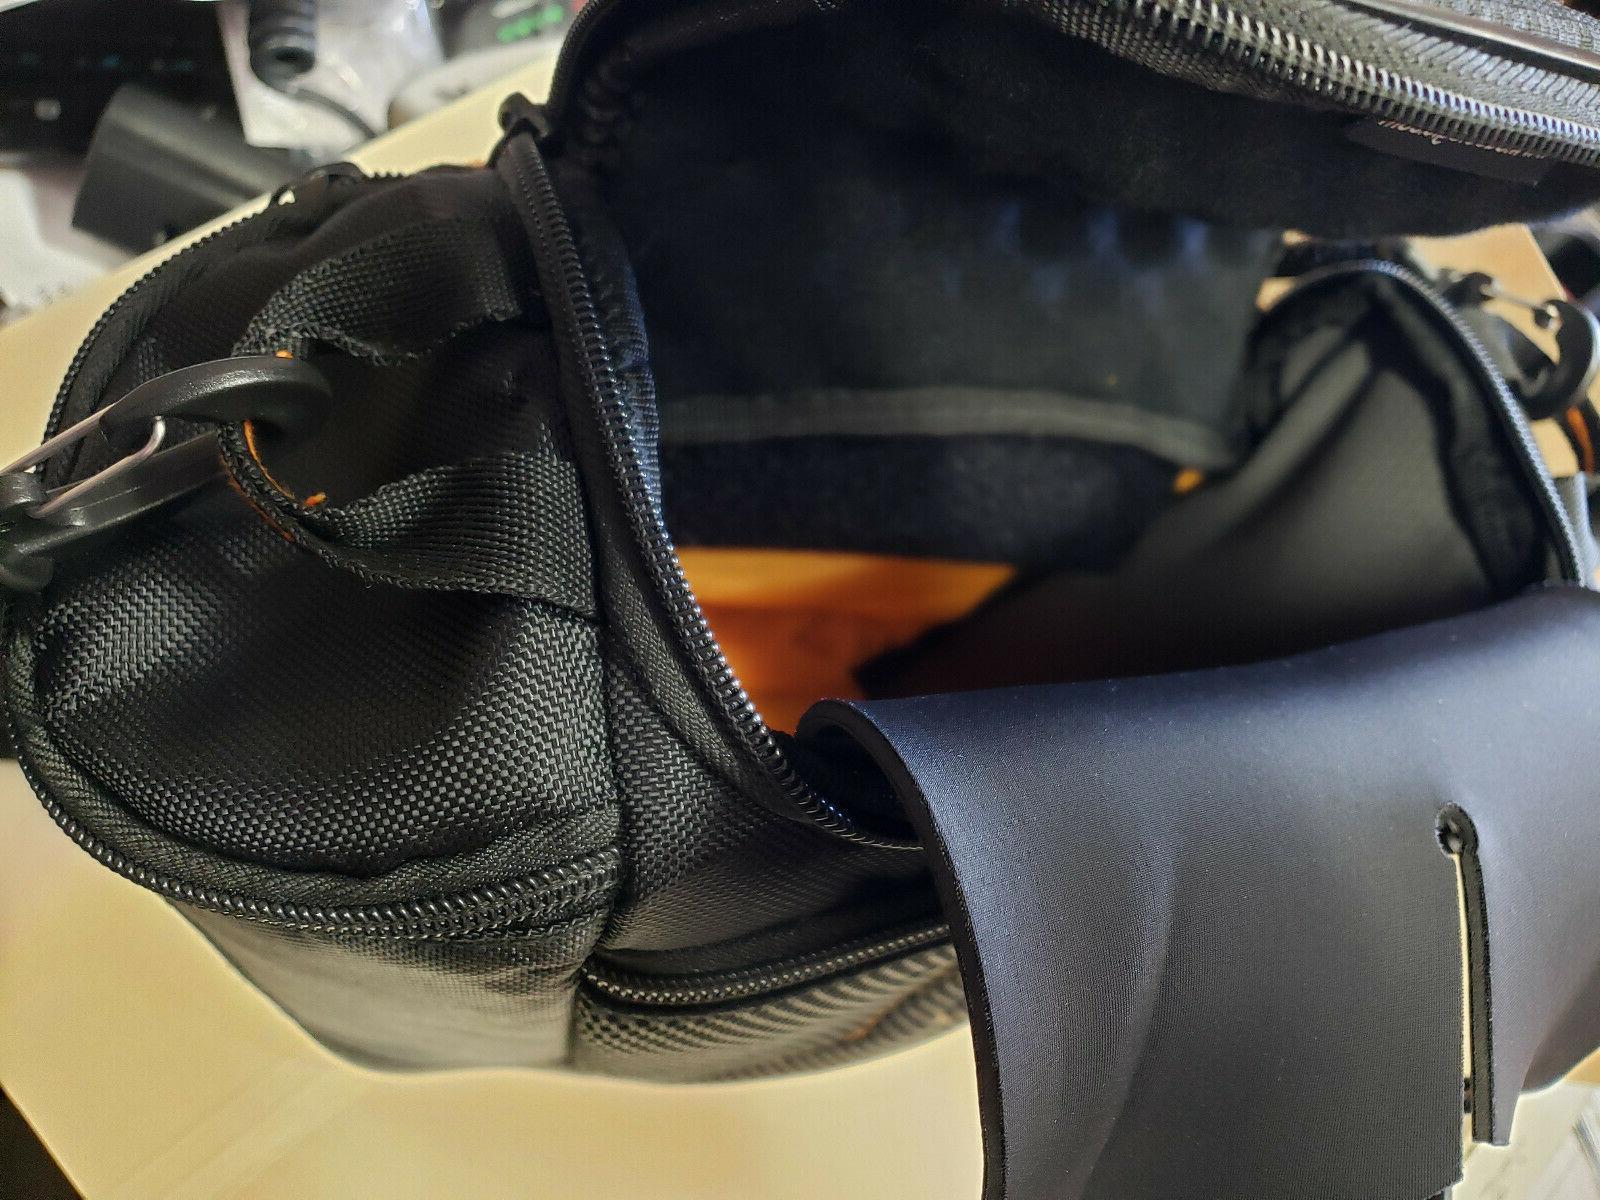 Case DSLR Camera New no tags